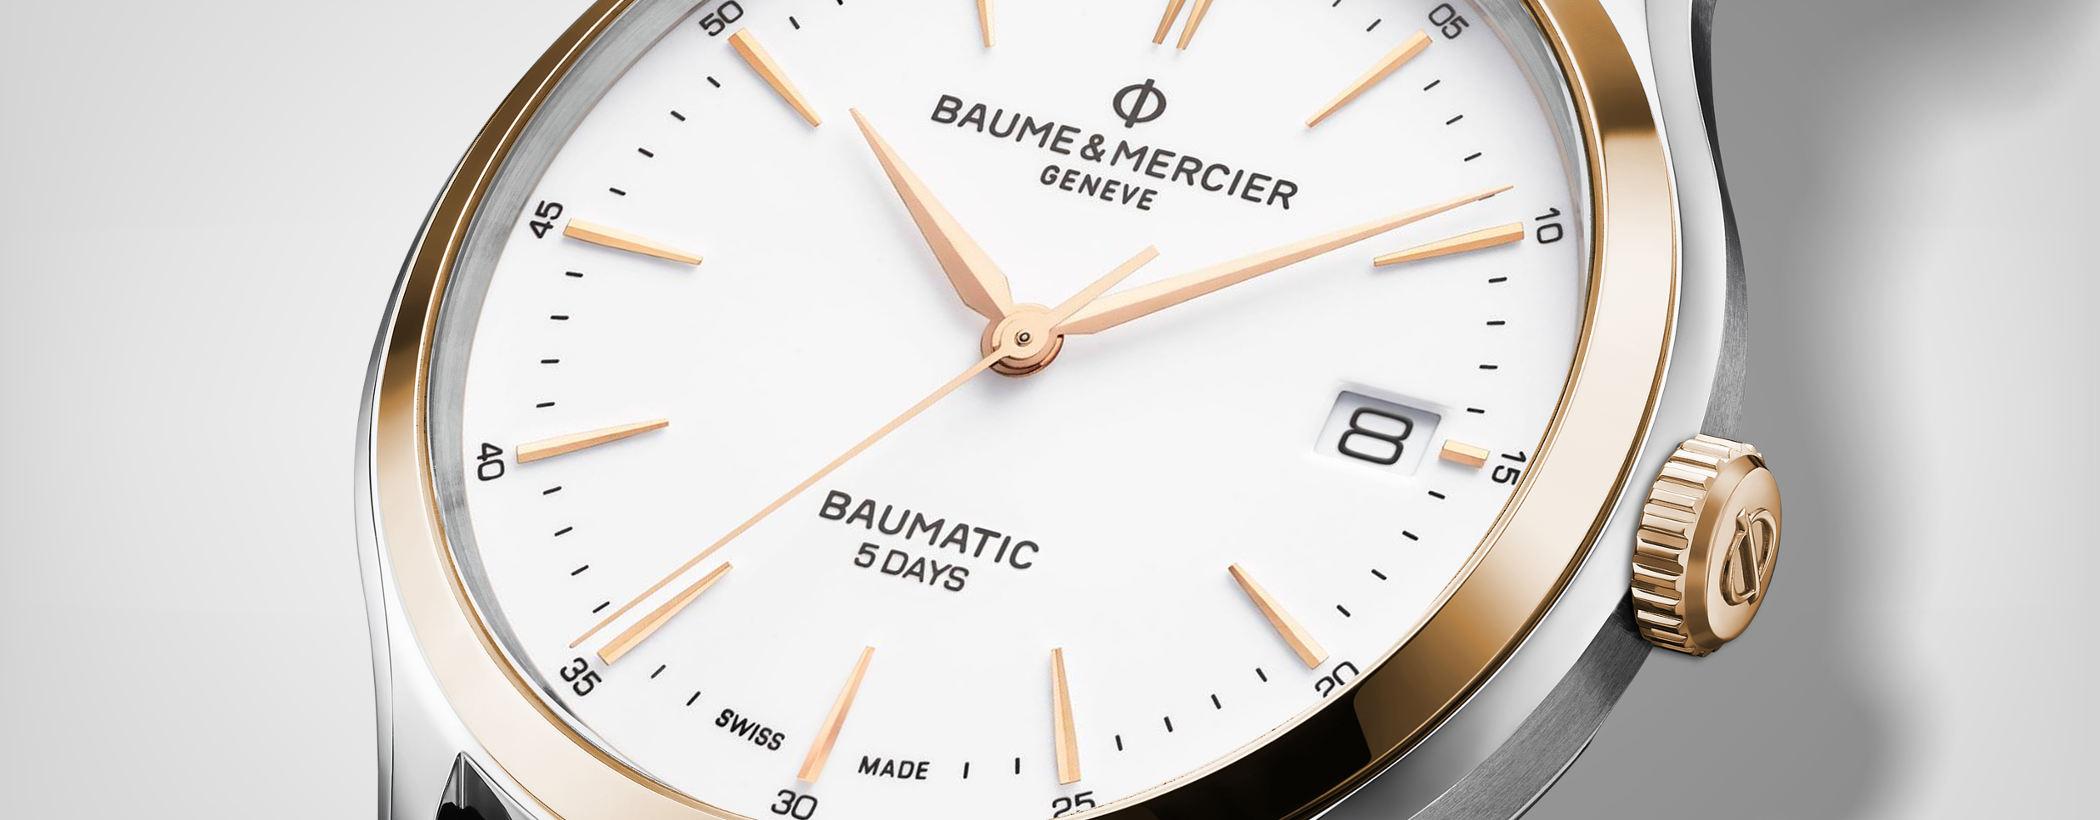 Baume & Mercier Clifton Baumatic Modell 10401